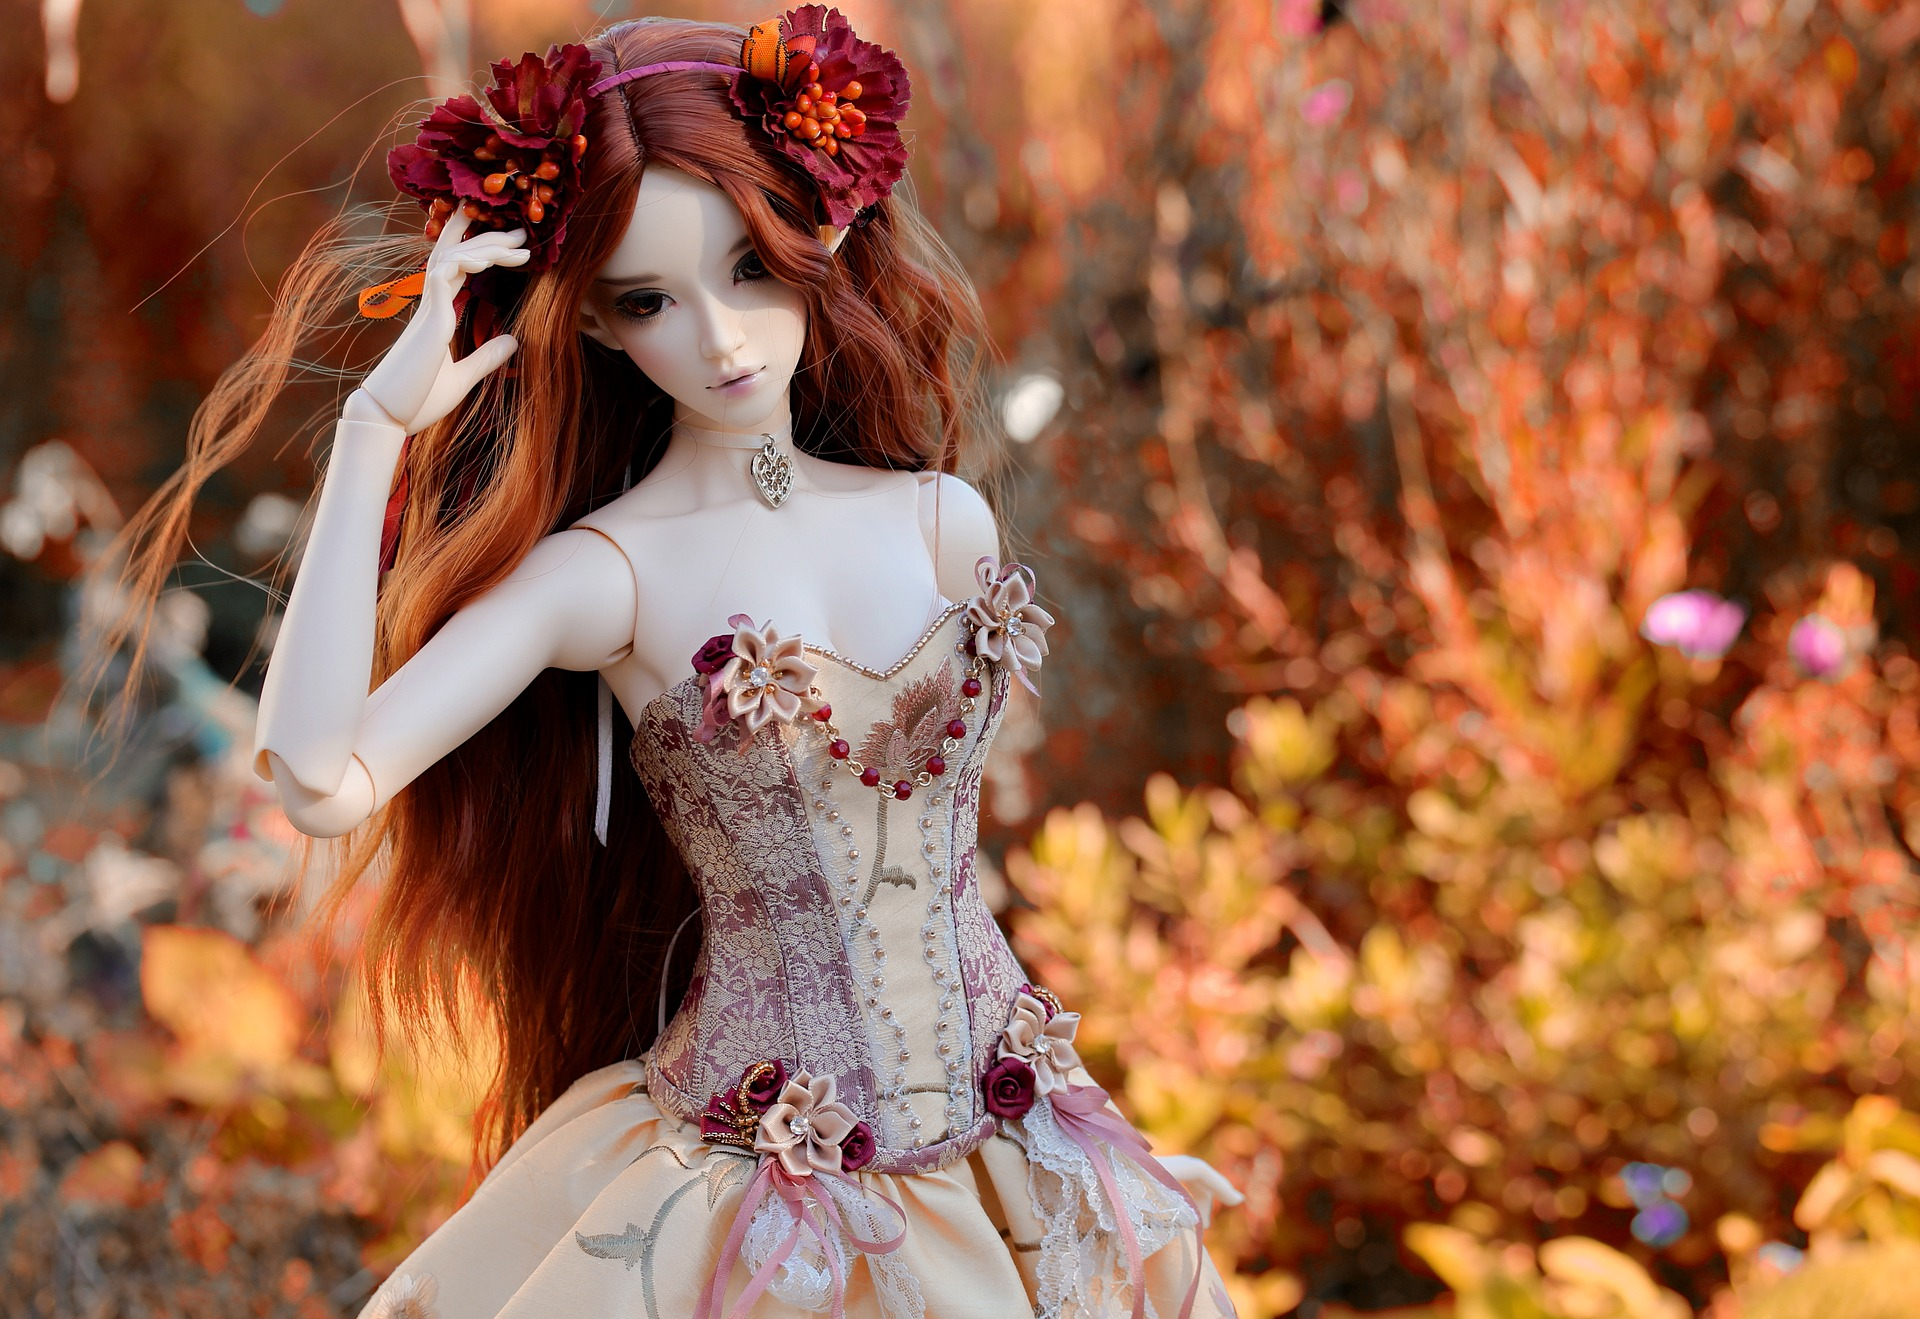 doll-1907768_1920.jpg